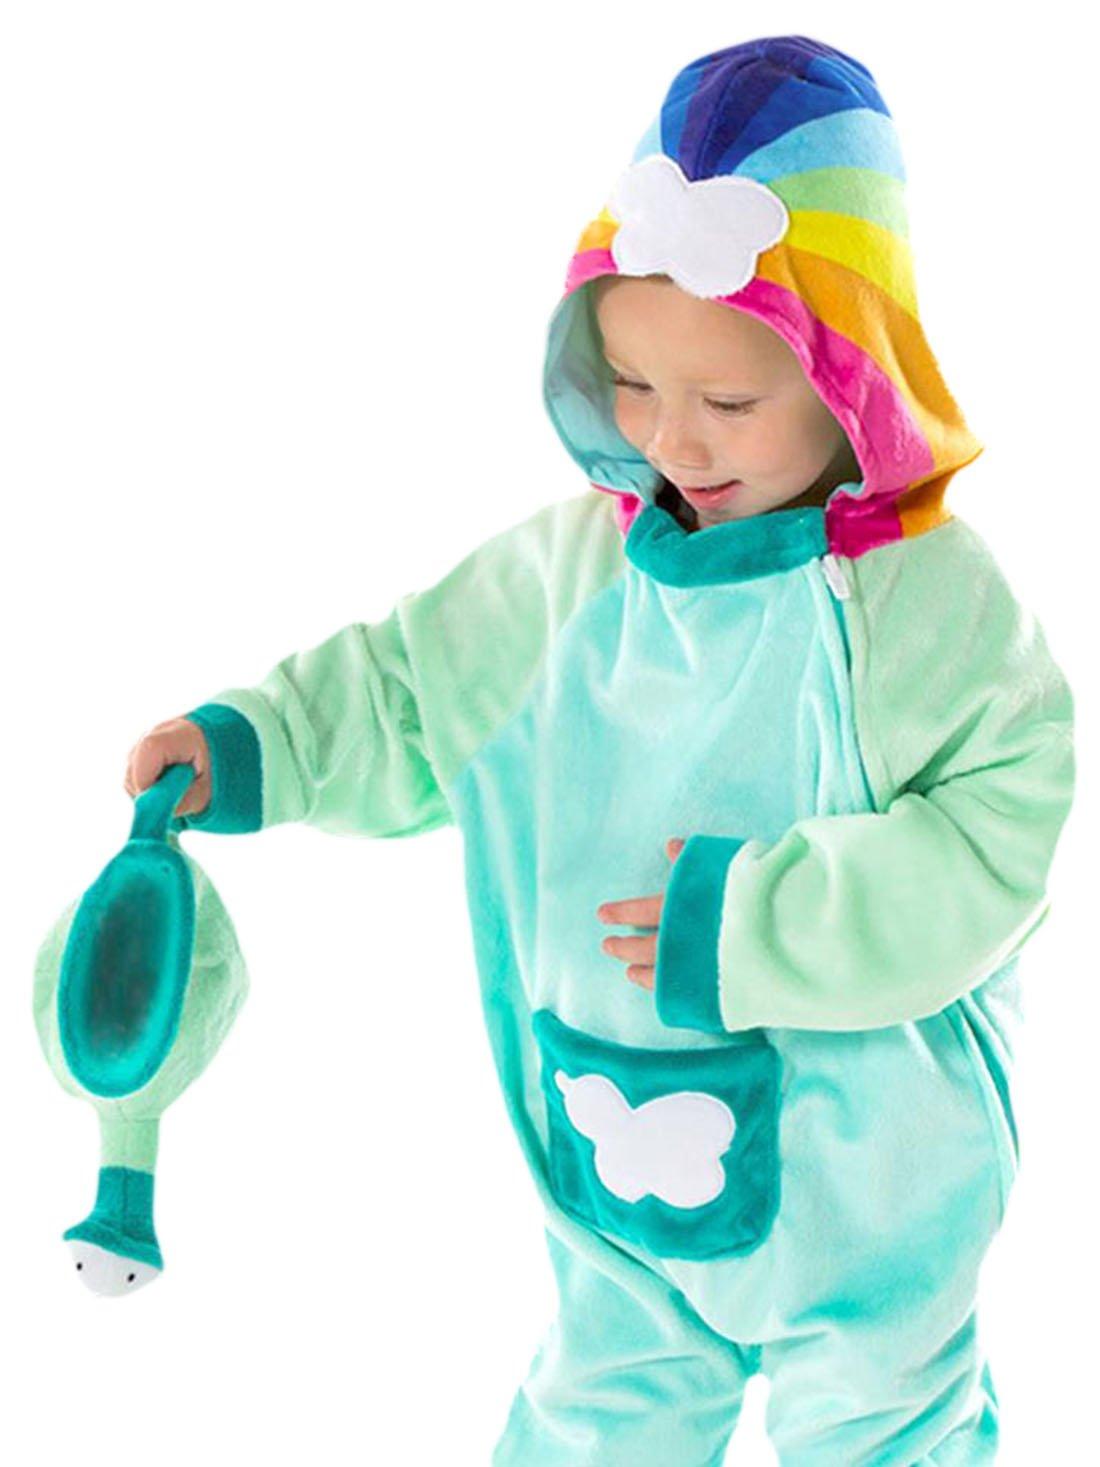 Confettery - Kinder Wolkenkind Jumpsuit Komplett Kostüm Karneval , Mehrfarbig, Größe 92-98, 2-3 Jahre